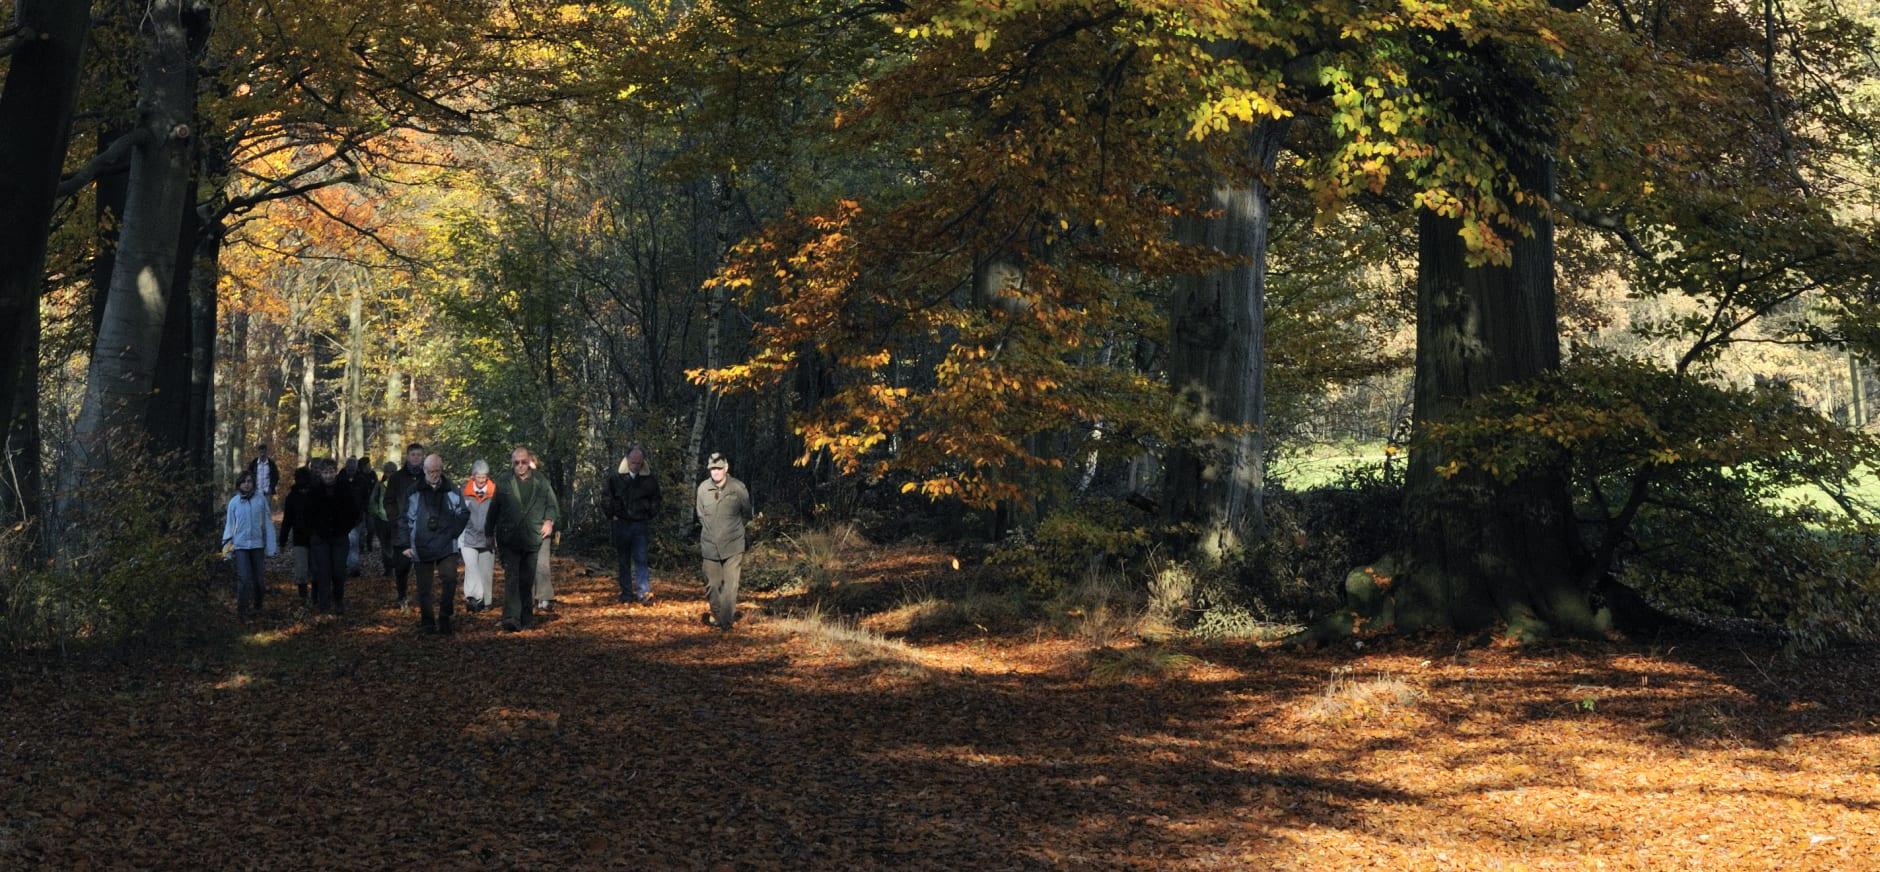 Wandeling op de Oude Buisse Heide